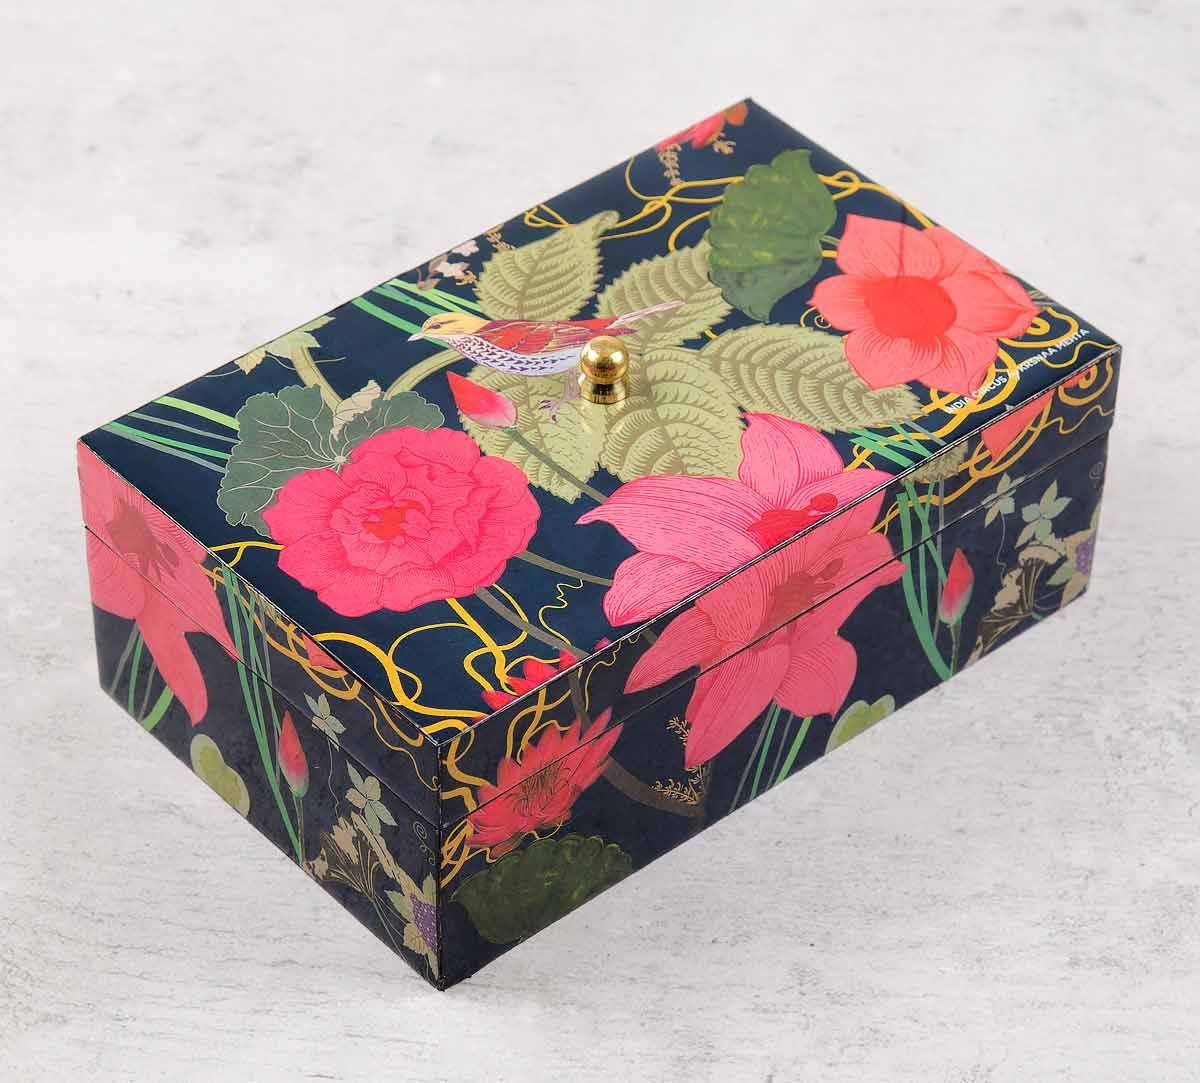 India Circus Blooming Bandish Enameled Storage Box